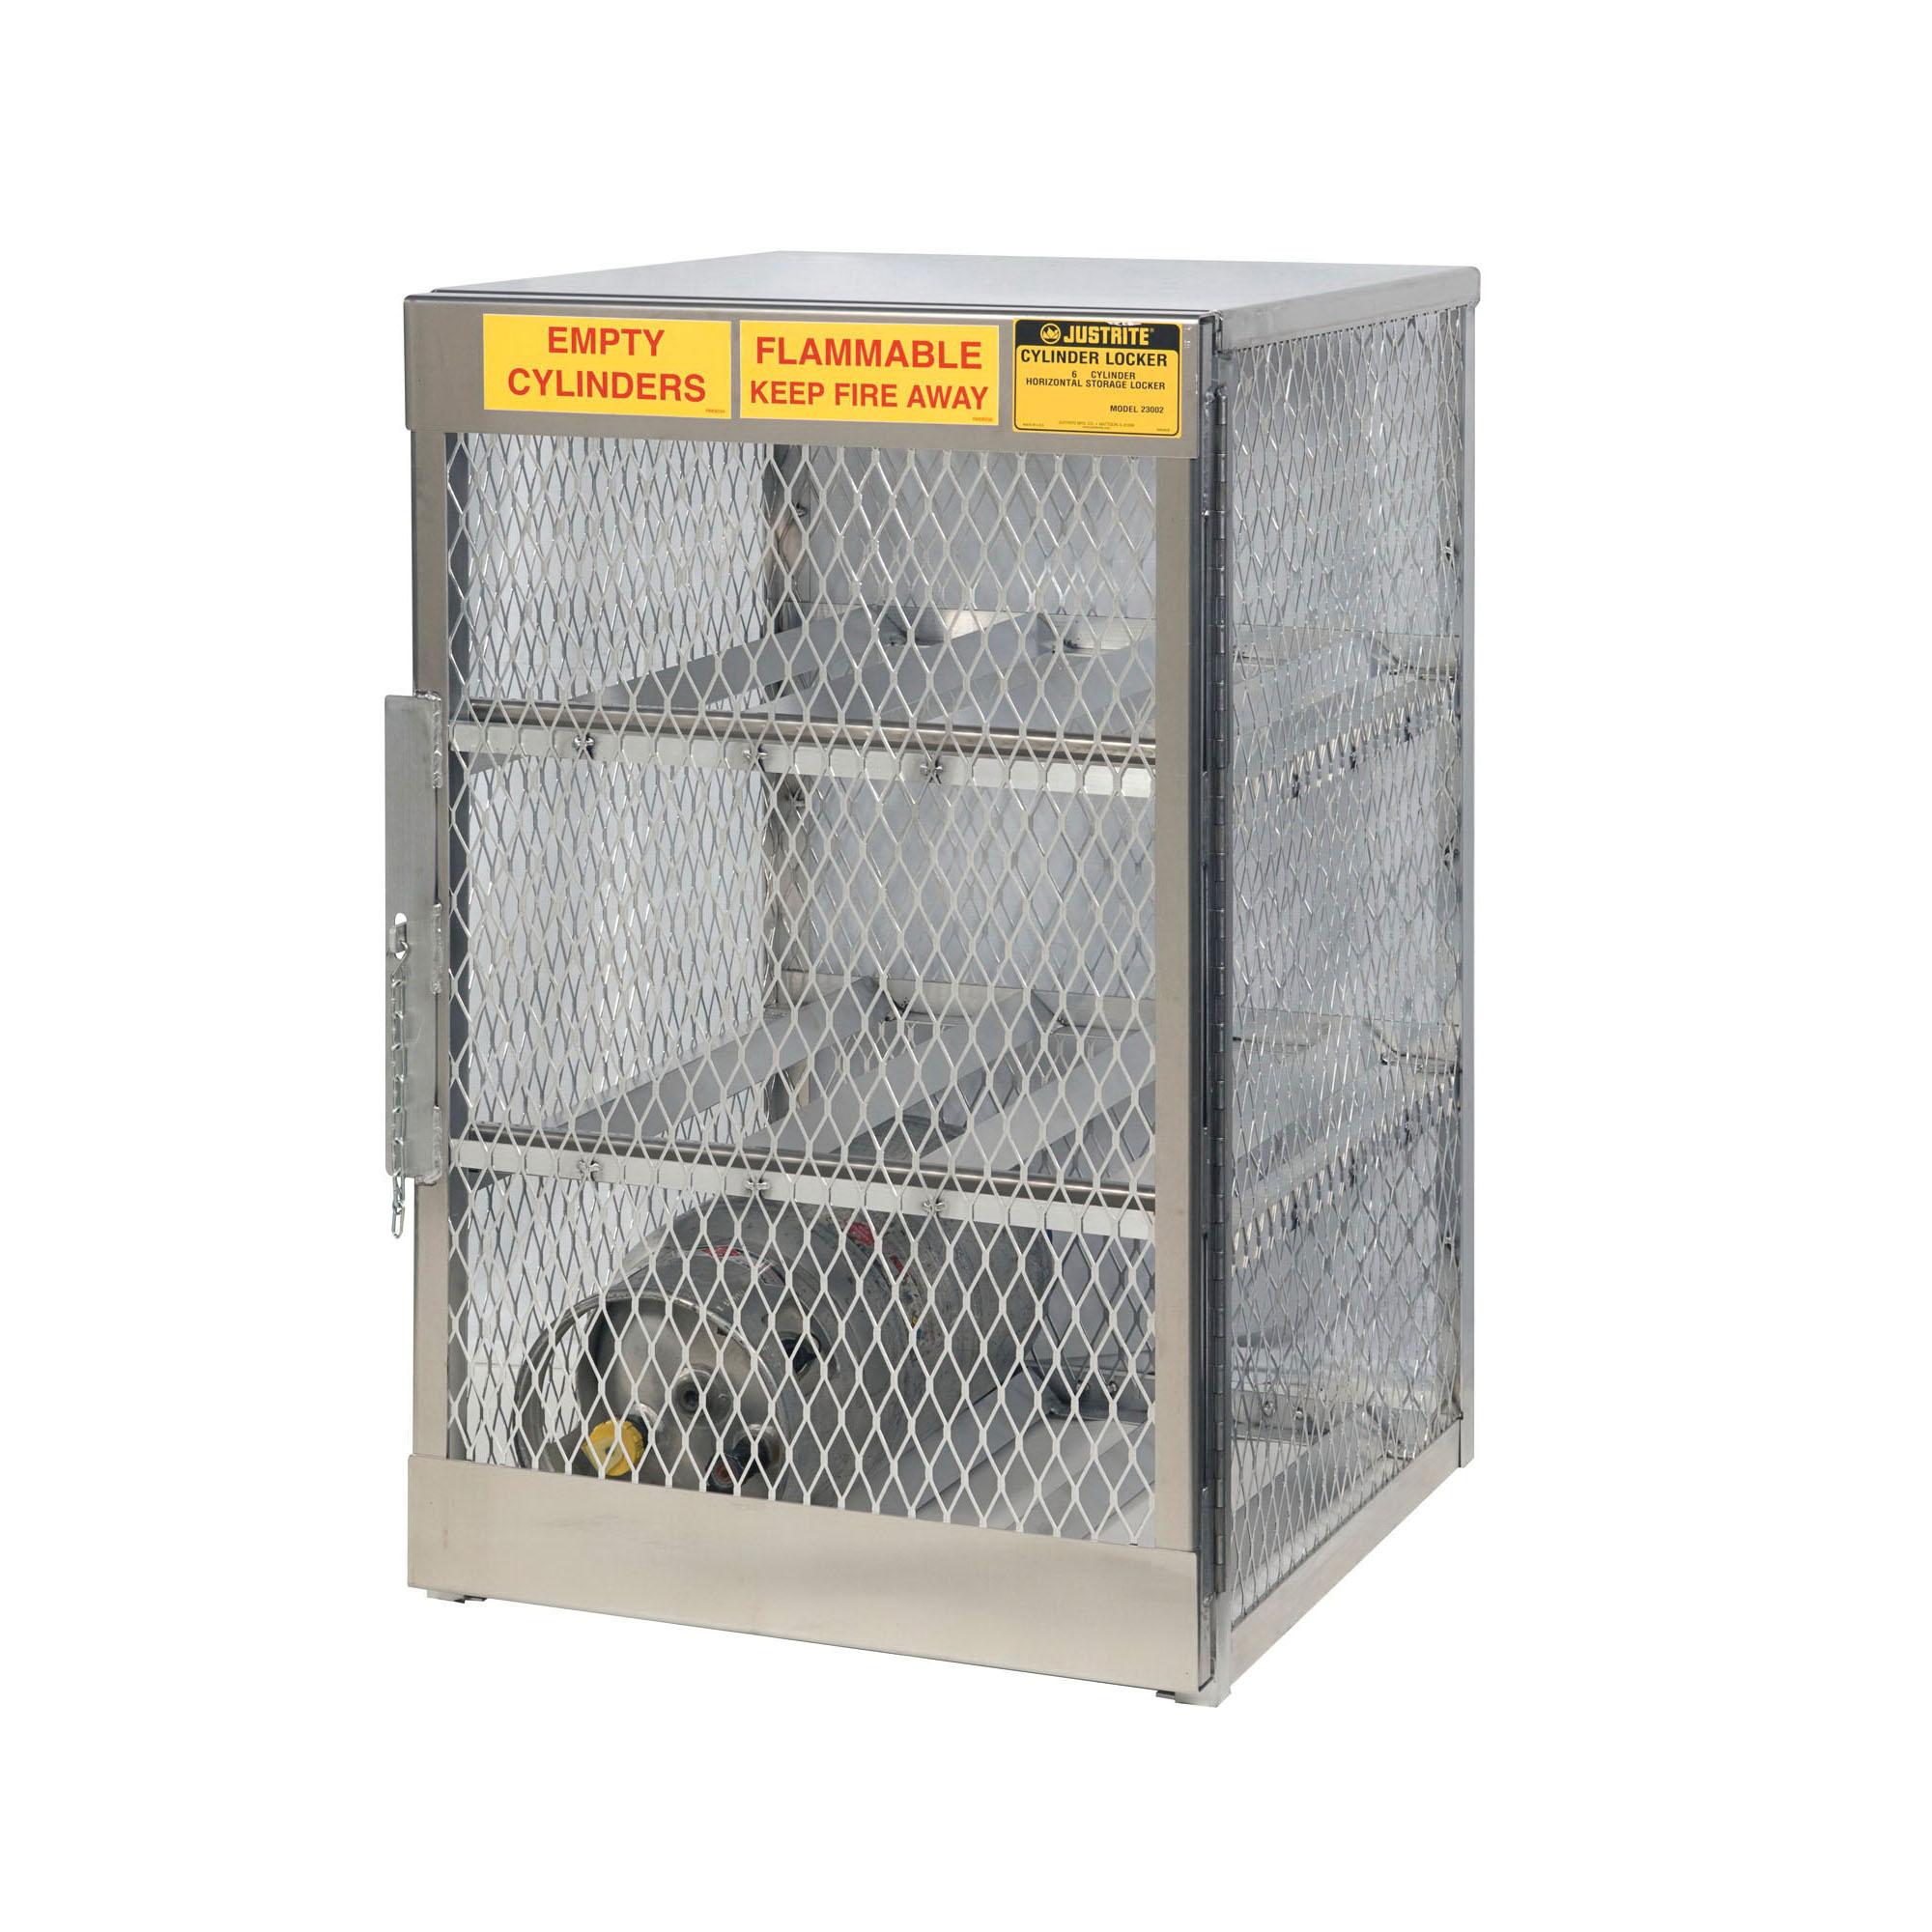 Justrite® 23002 Horizontal LPG Cylinder Locker, (6) 20 lb/33 lb, 49-1/2 in H x 30 in W x 32 in D, Aluminum Roof, Welded Aluminum, Aluminum